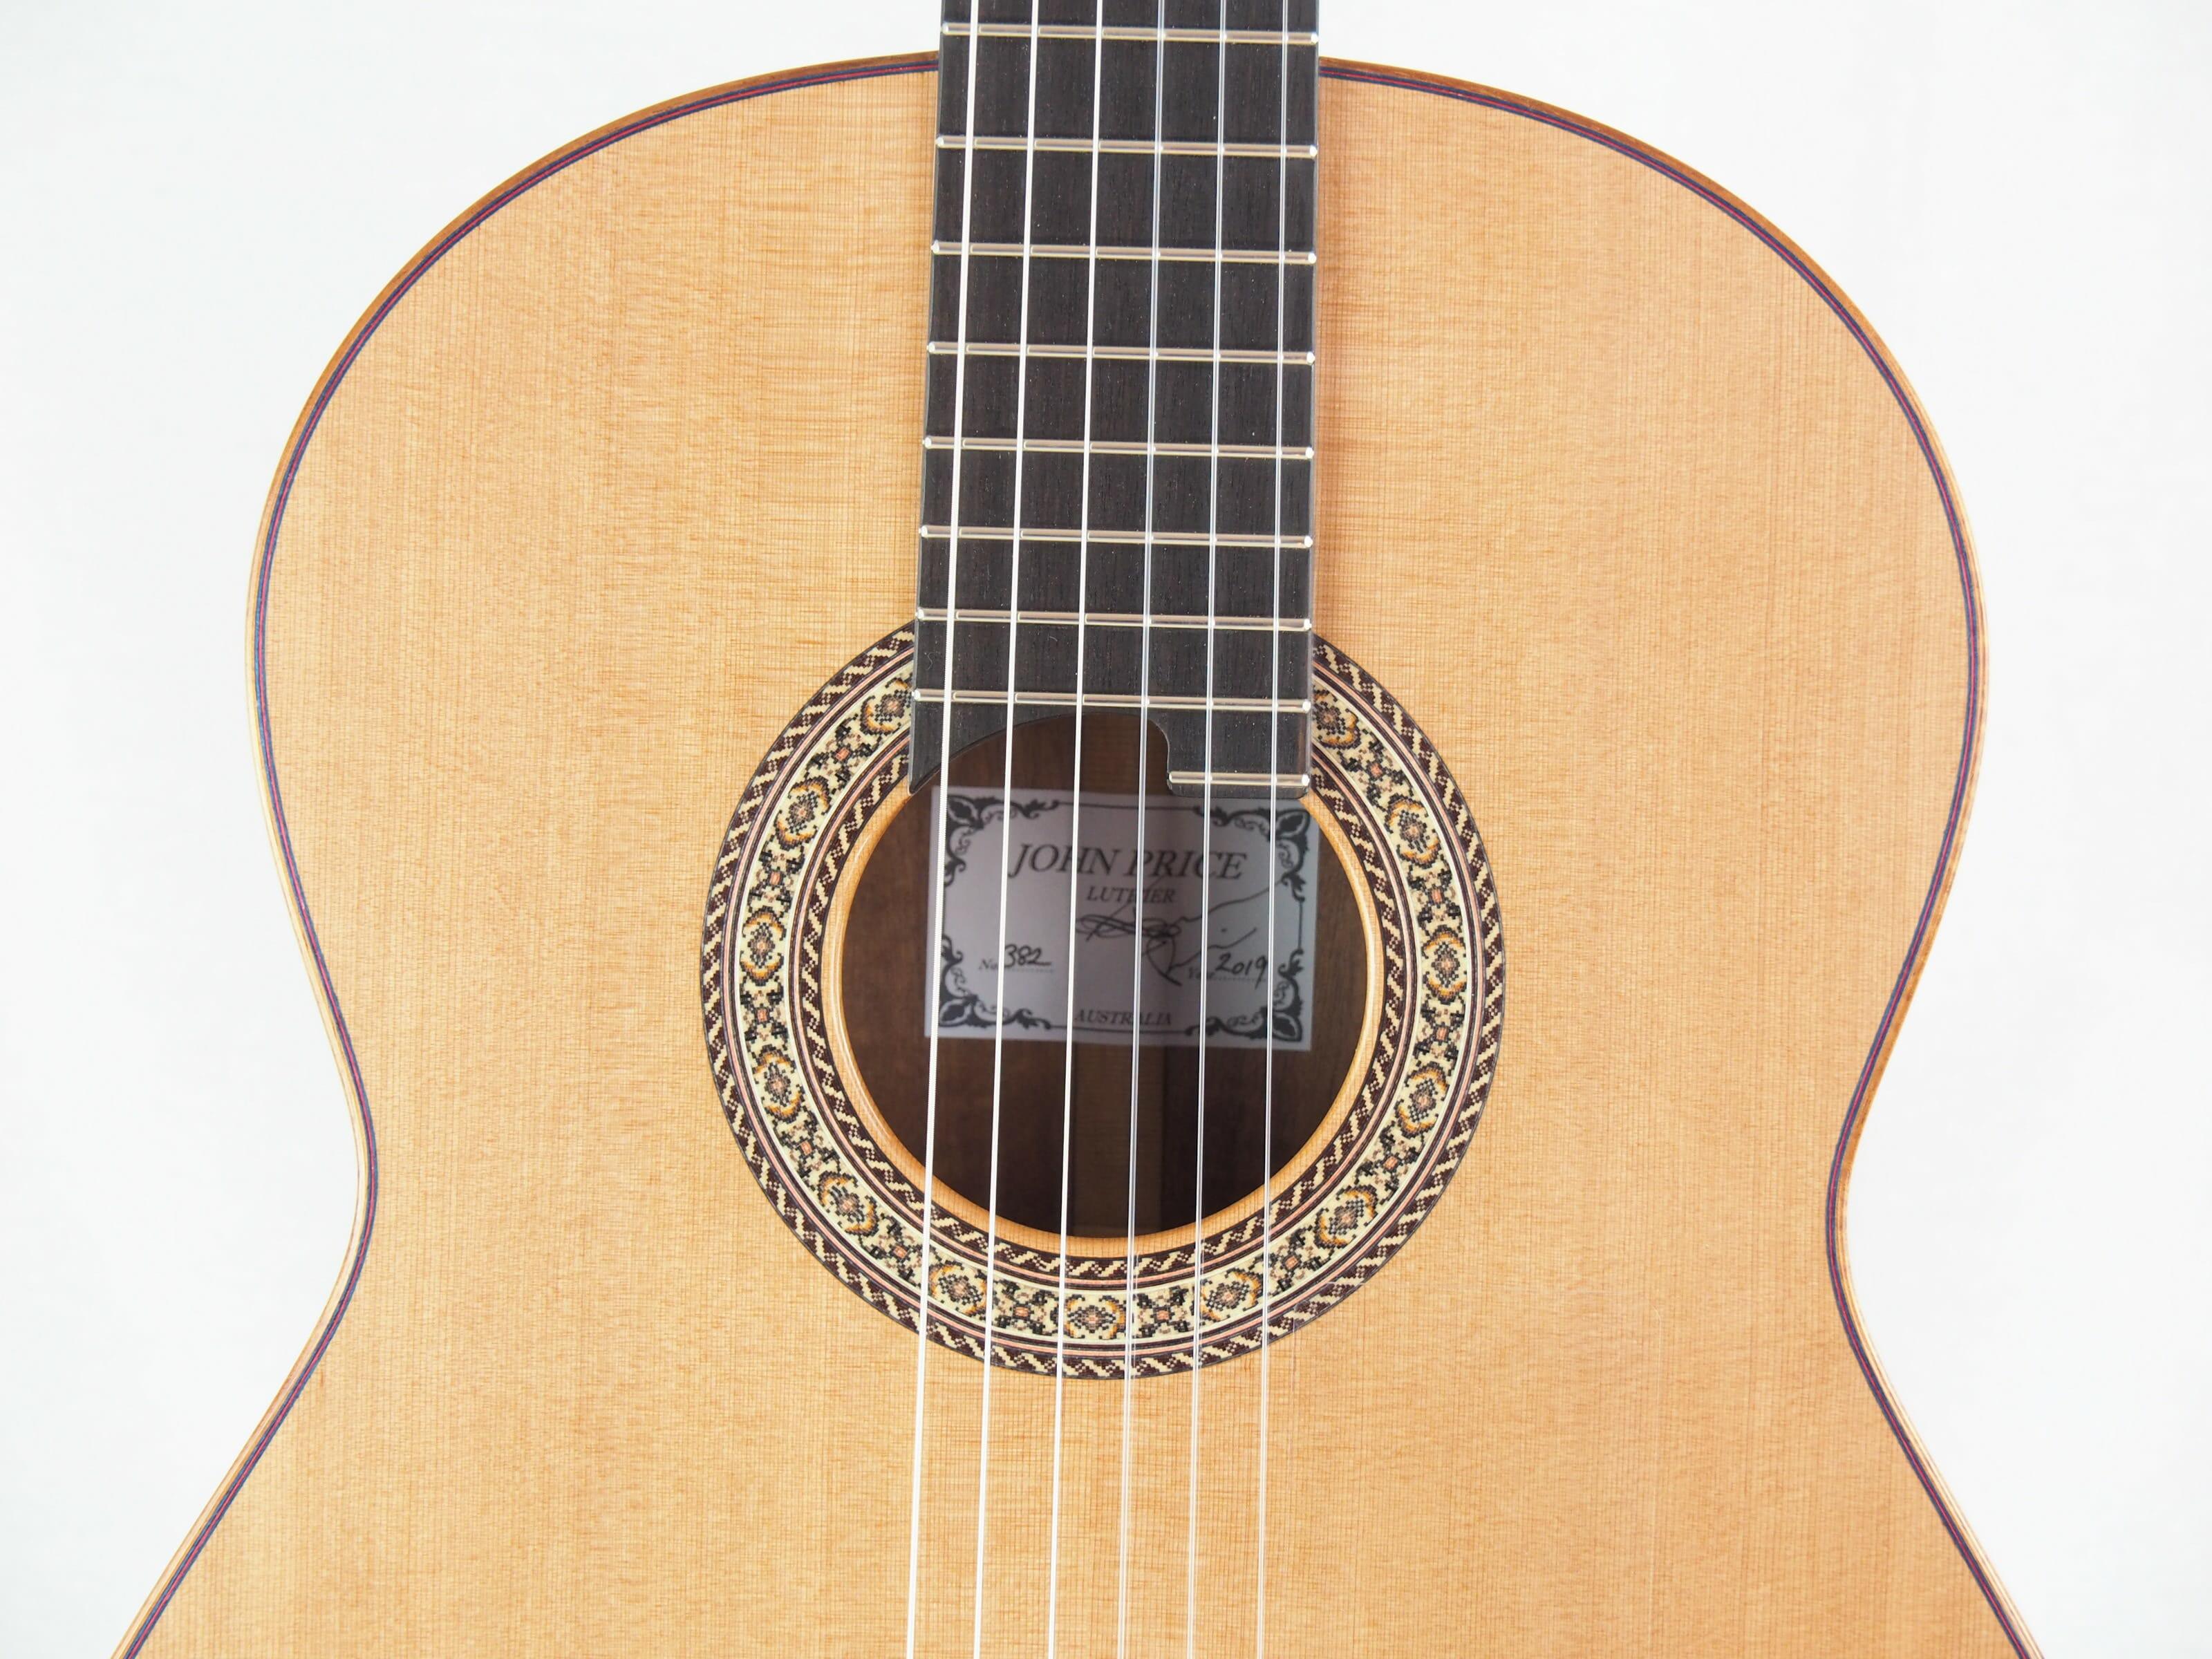 Guitare classique luthier John Price No 382 19PRI382-11